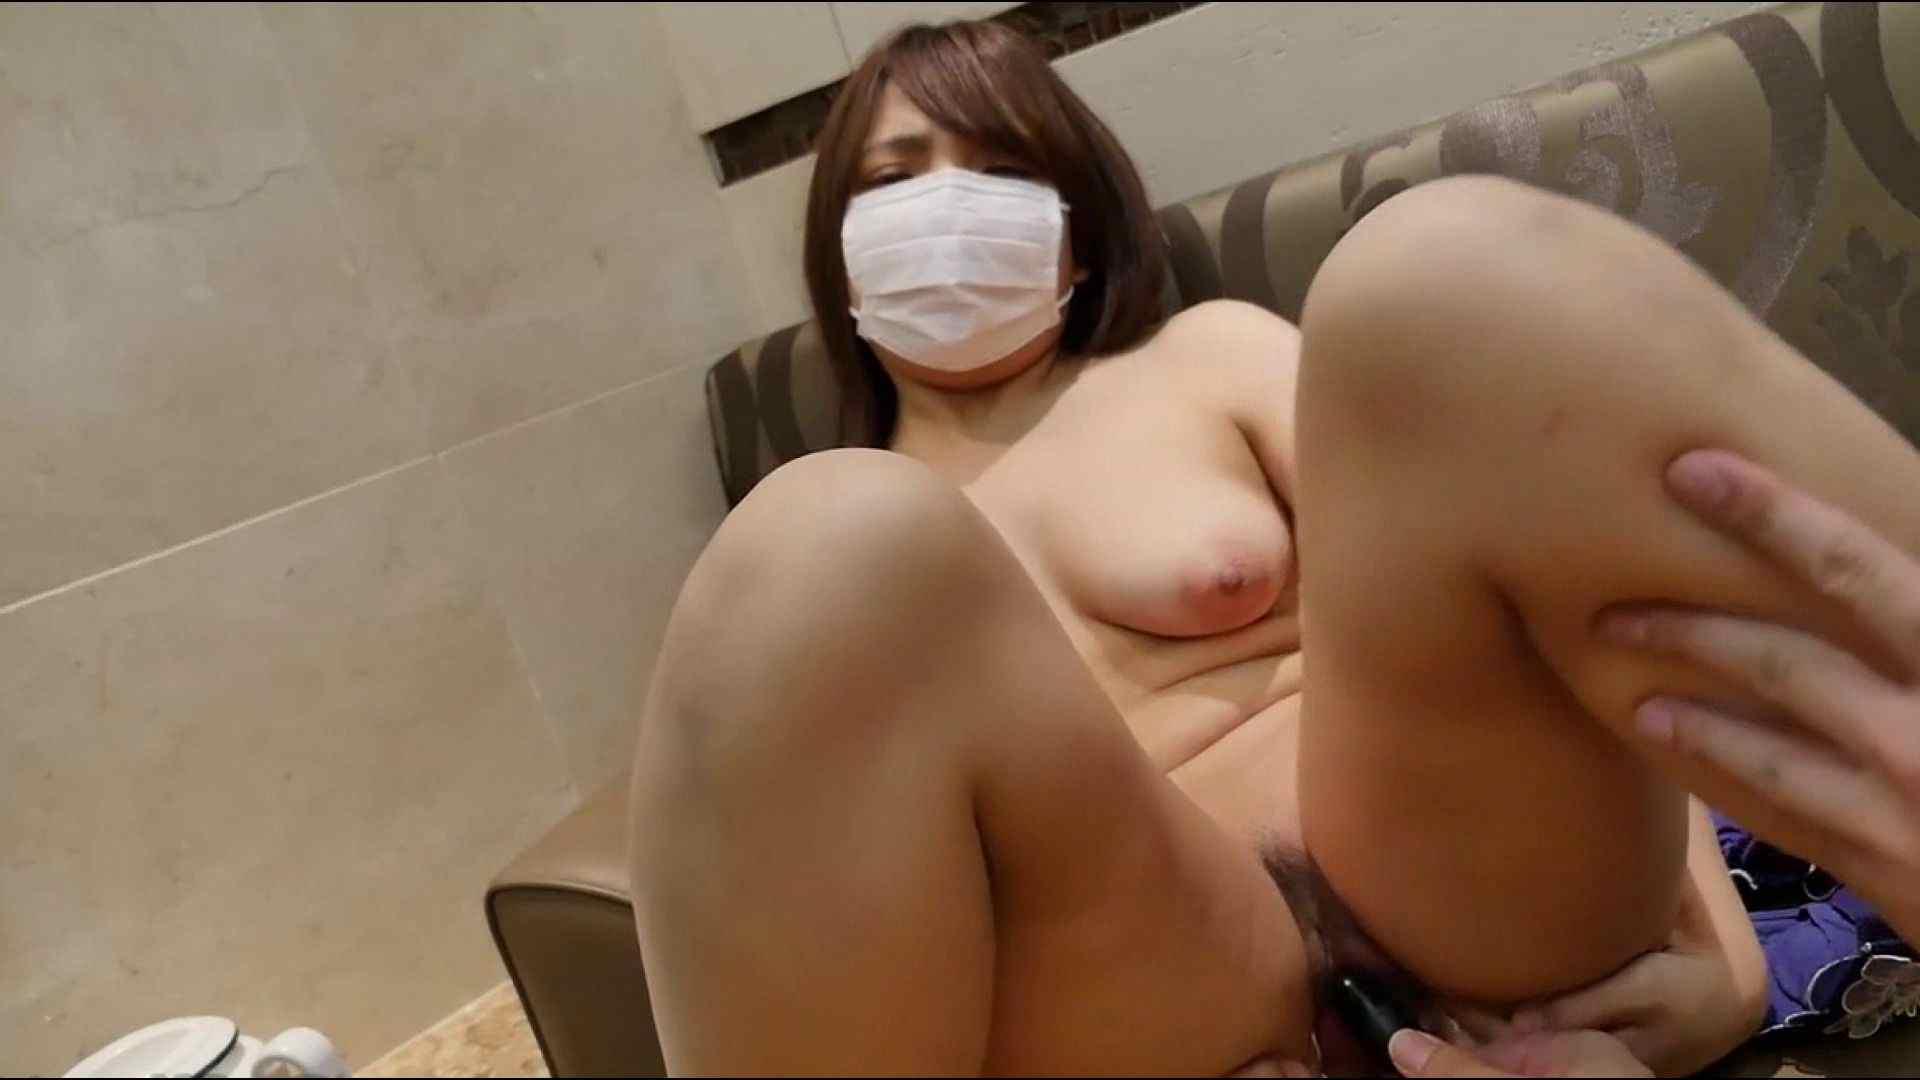 S級厳選美女ビッチガールVol.41 前編 モデル | 美女丸裸  99pic 94